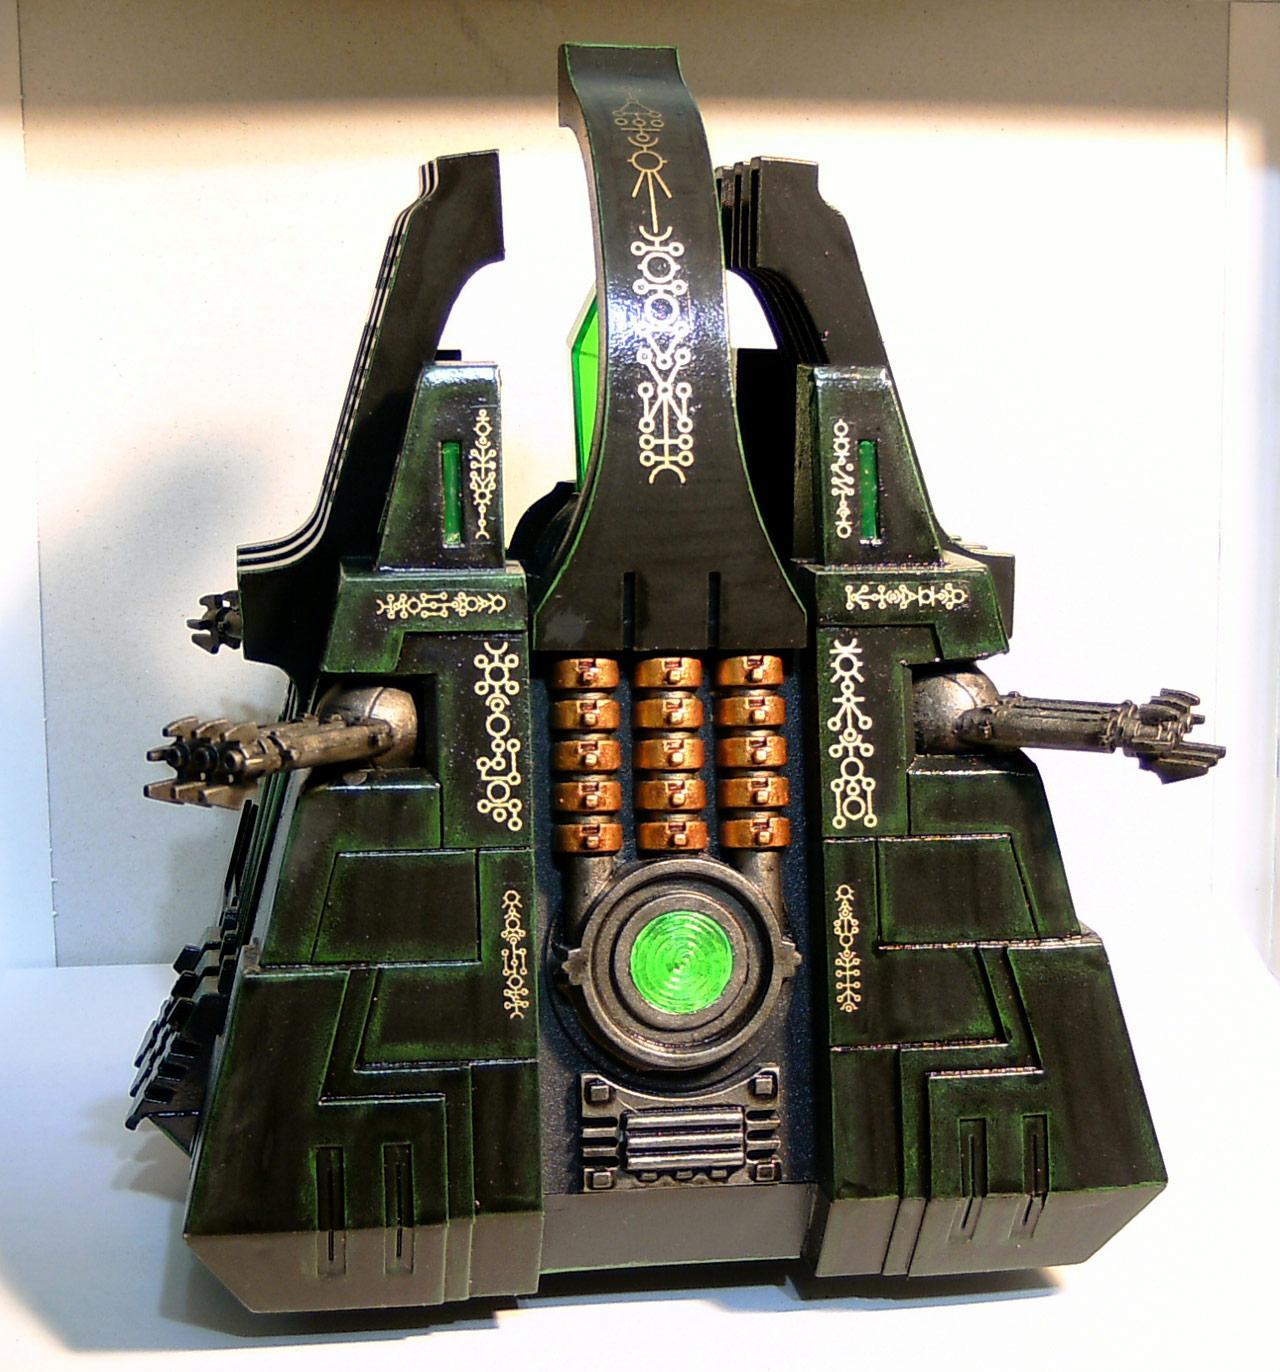 LED, Lighted, Monolith, Necrons, Warhammer 40,000